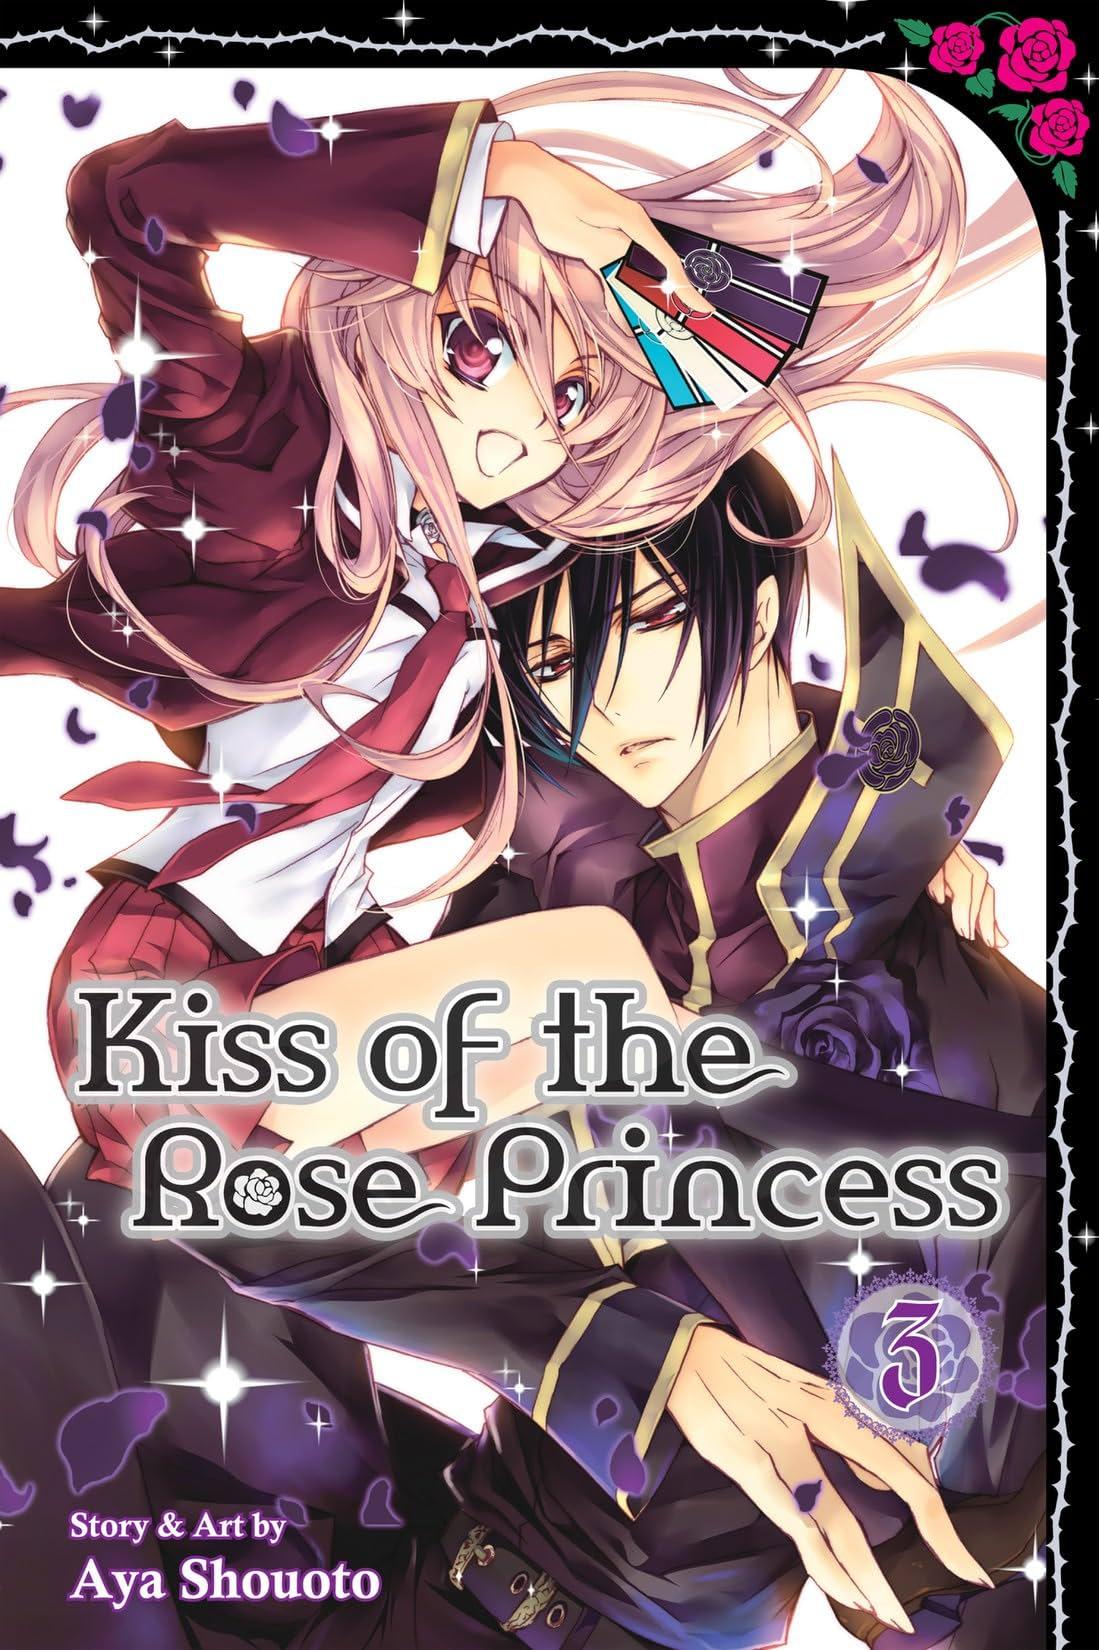 Kiss of the Rose Princess Vol. 3